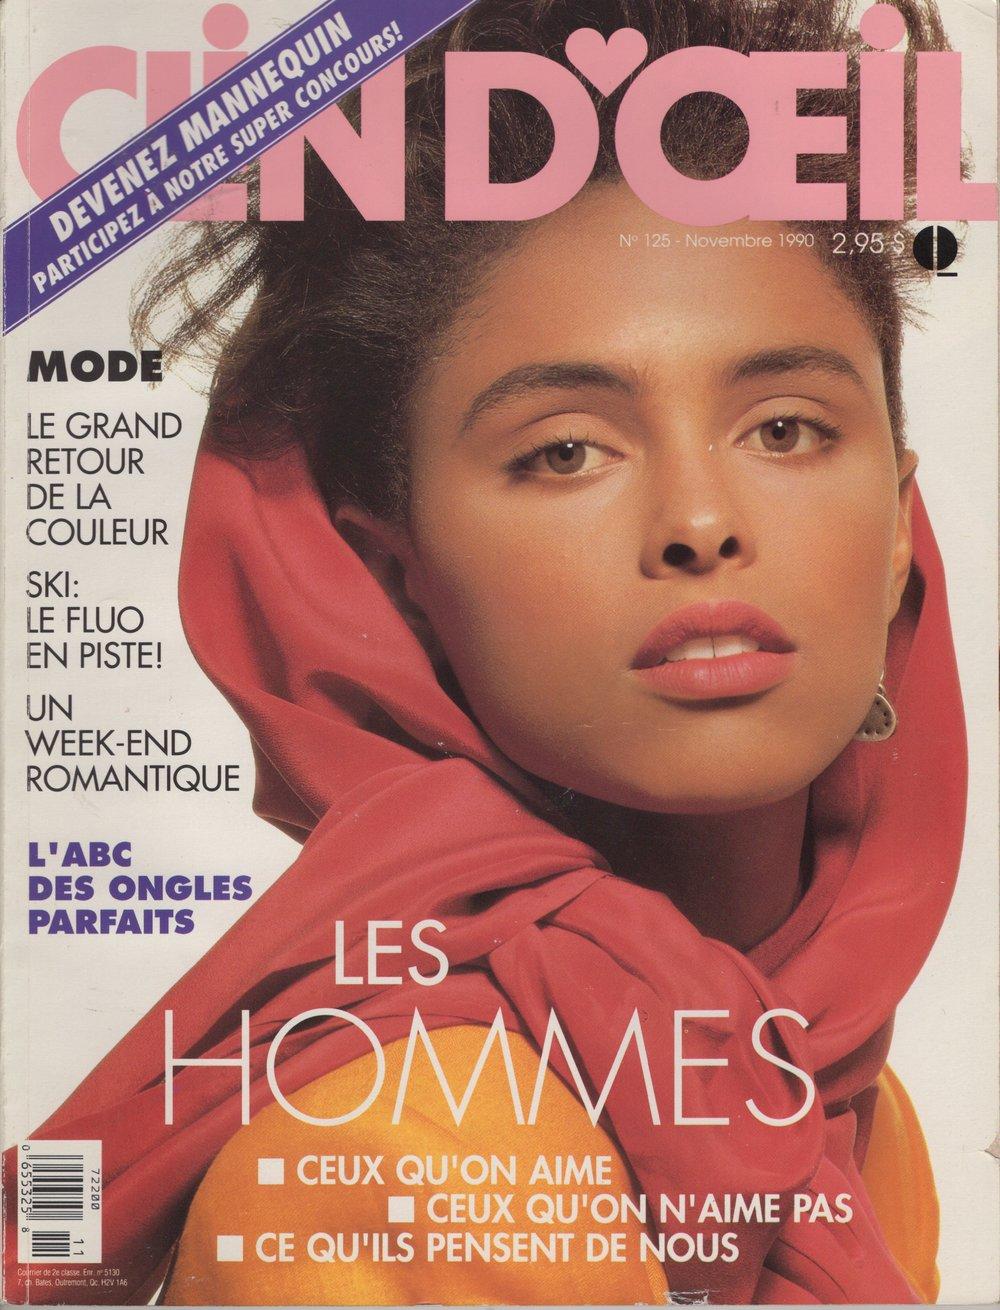 Clin D'Oeil 1990 copy.jpeg